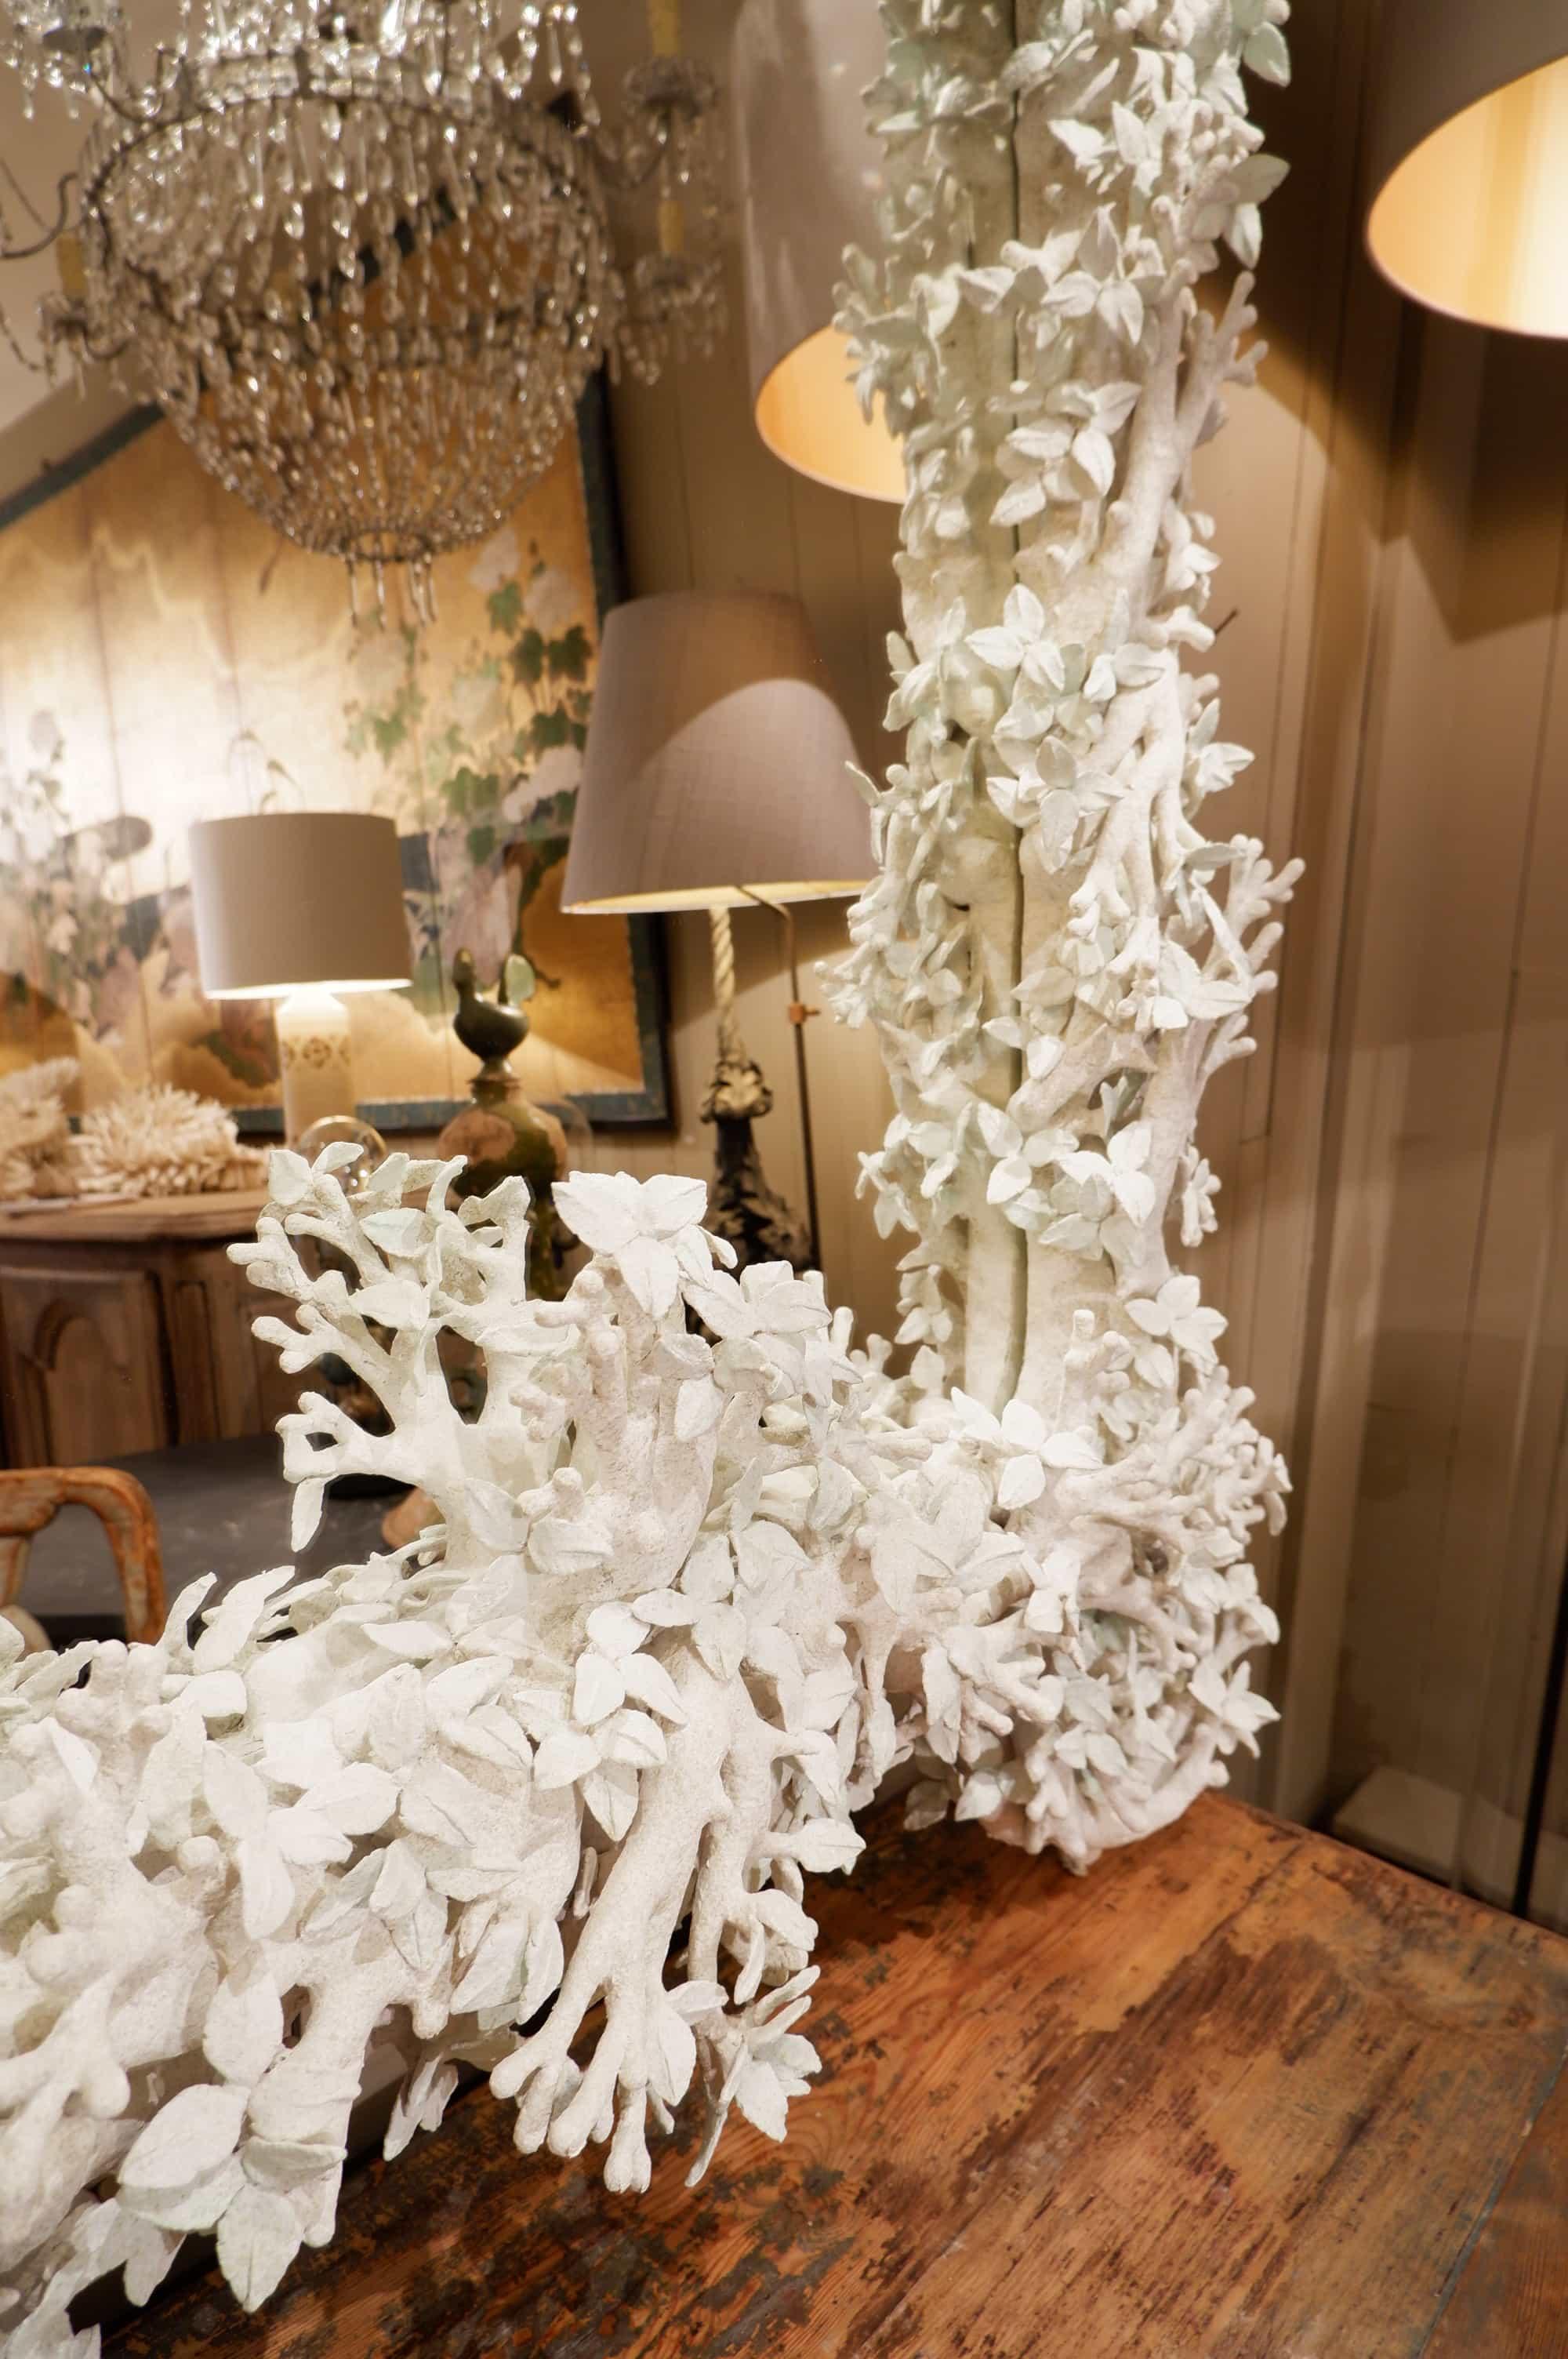 Grand miroir feuilles blanches par Edouard Chevalier